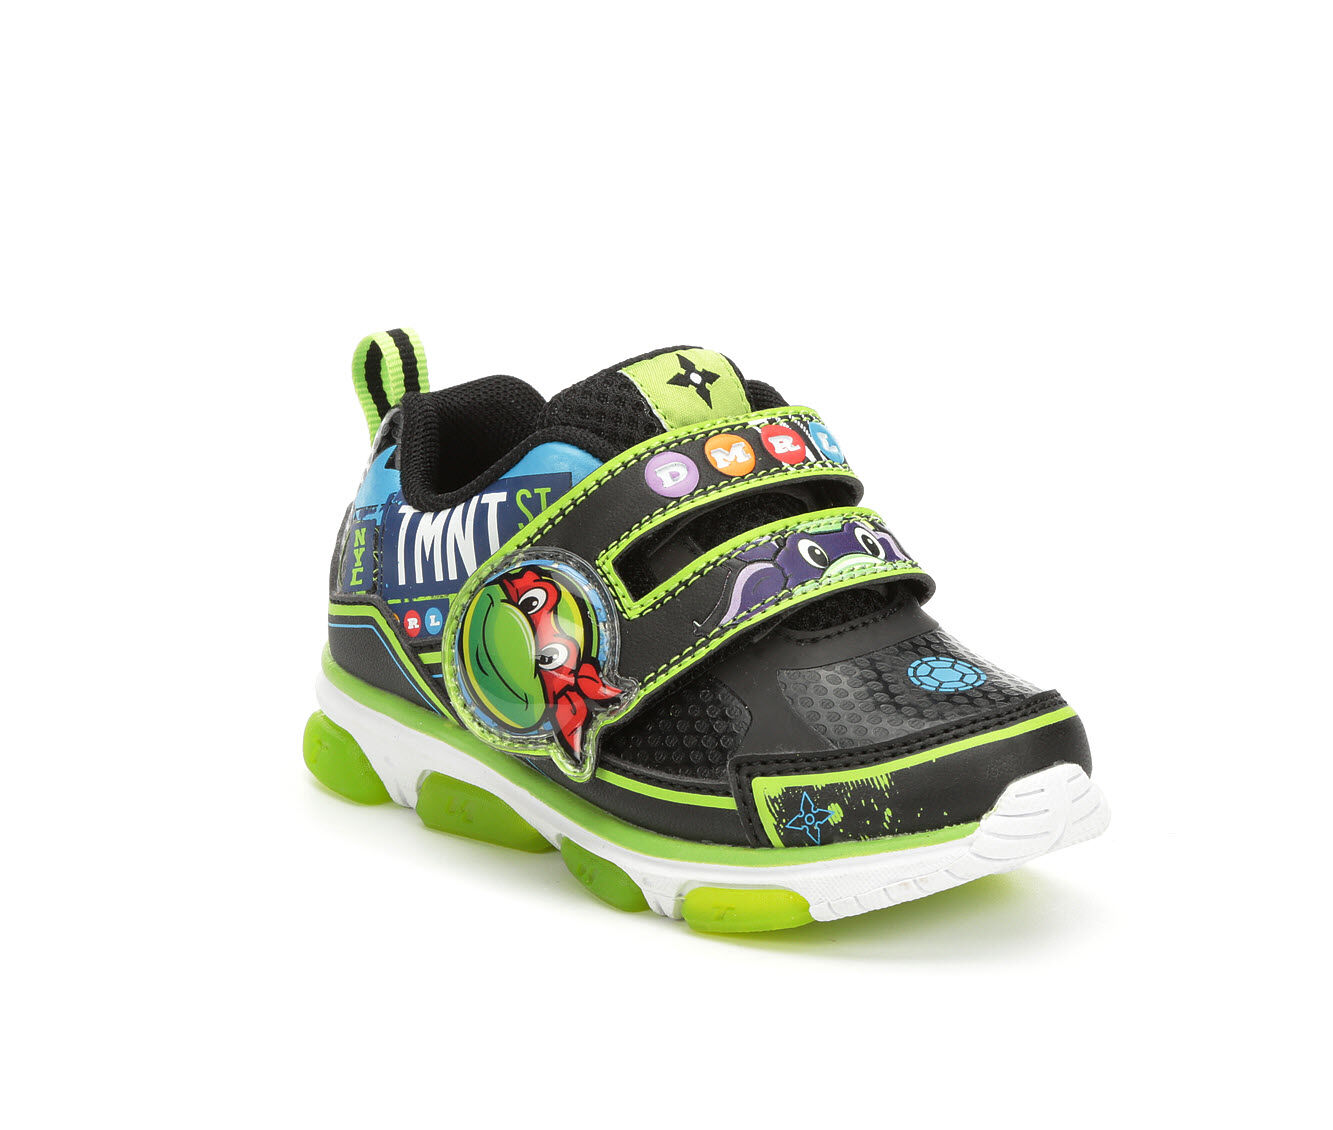 NEW New Nickelodeon Teenage Mutant Ninja Turtles Toddler Light Up Sneakers 7